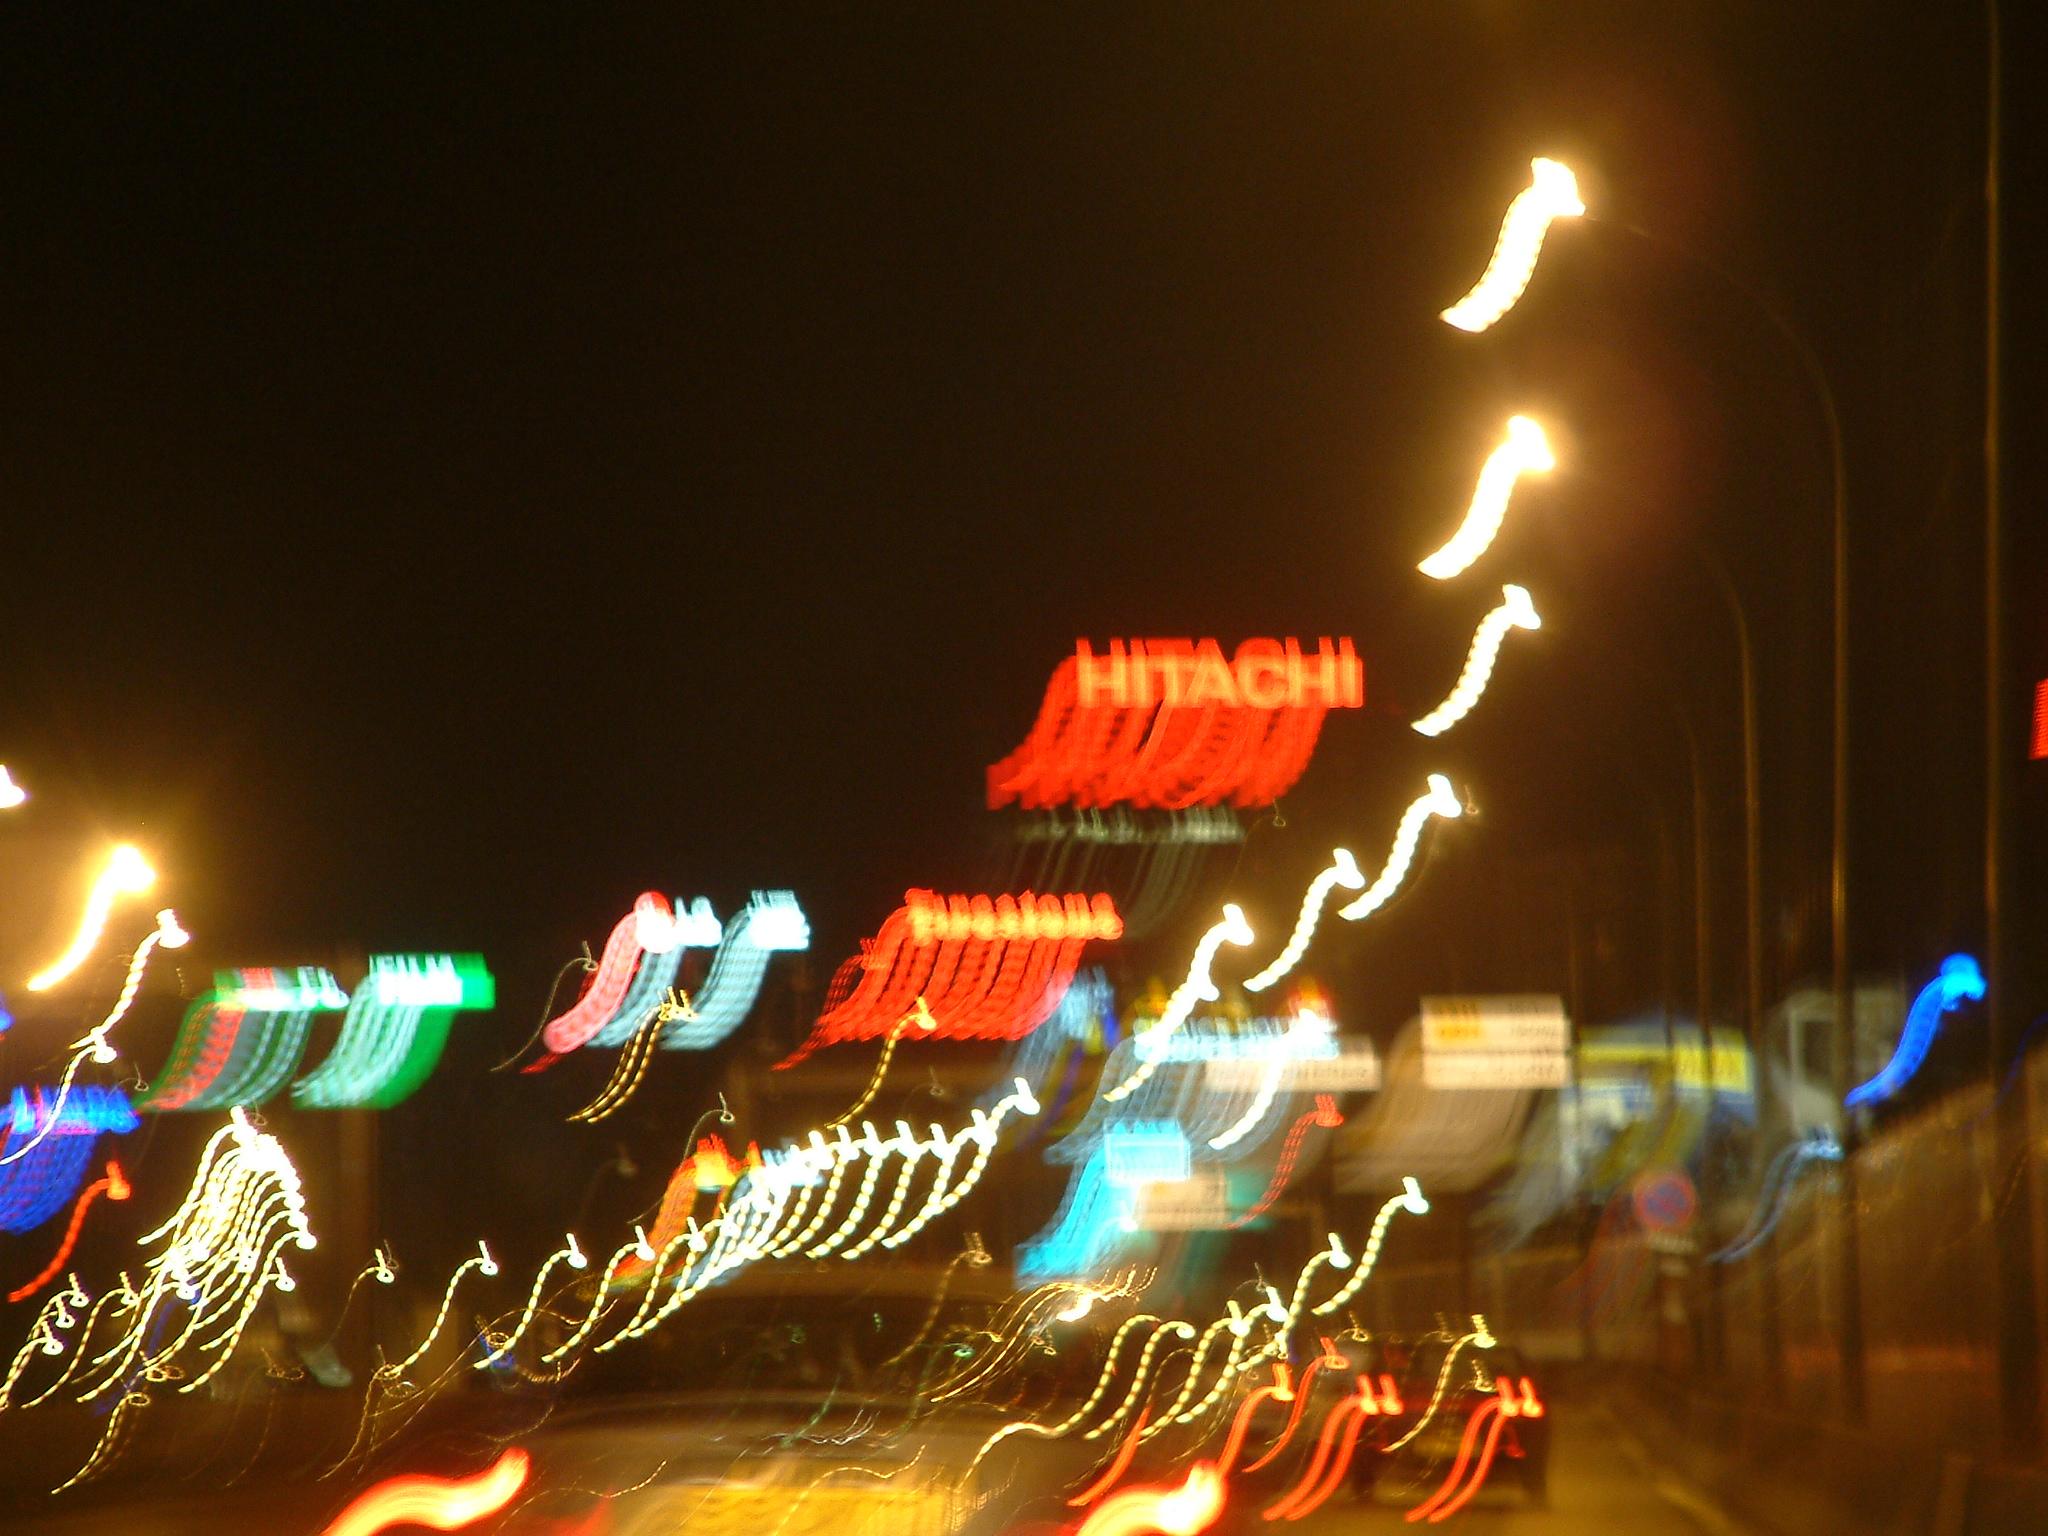 photos de nuit publicites lumineuses hitachi 010.jpg